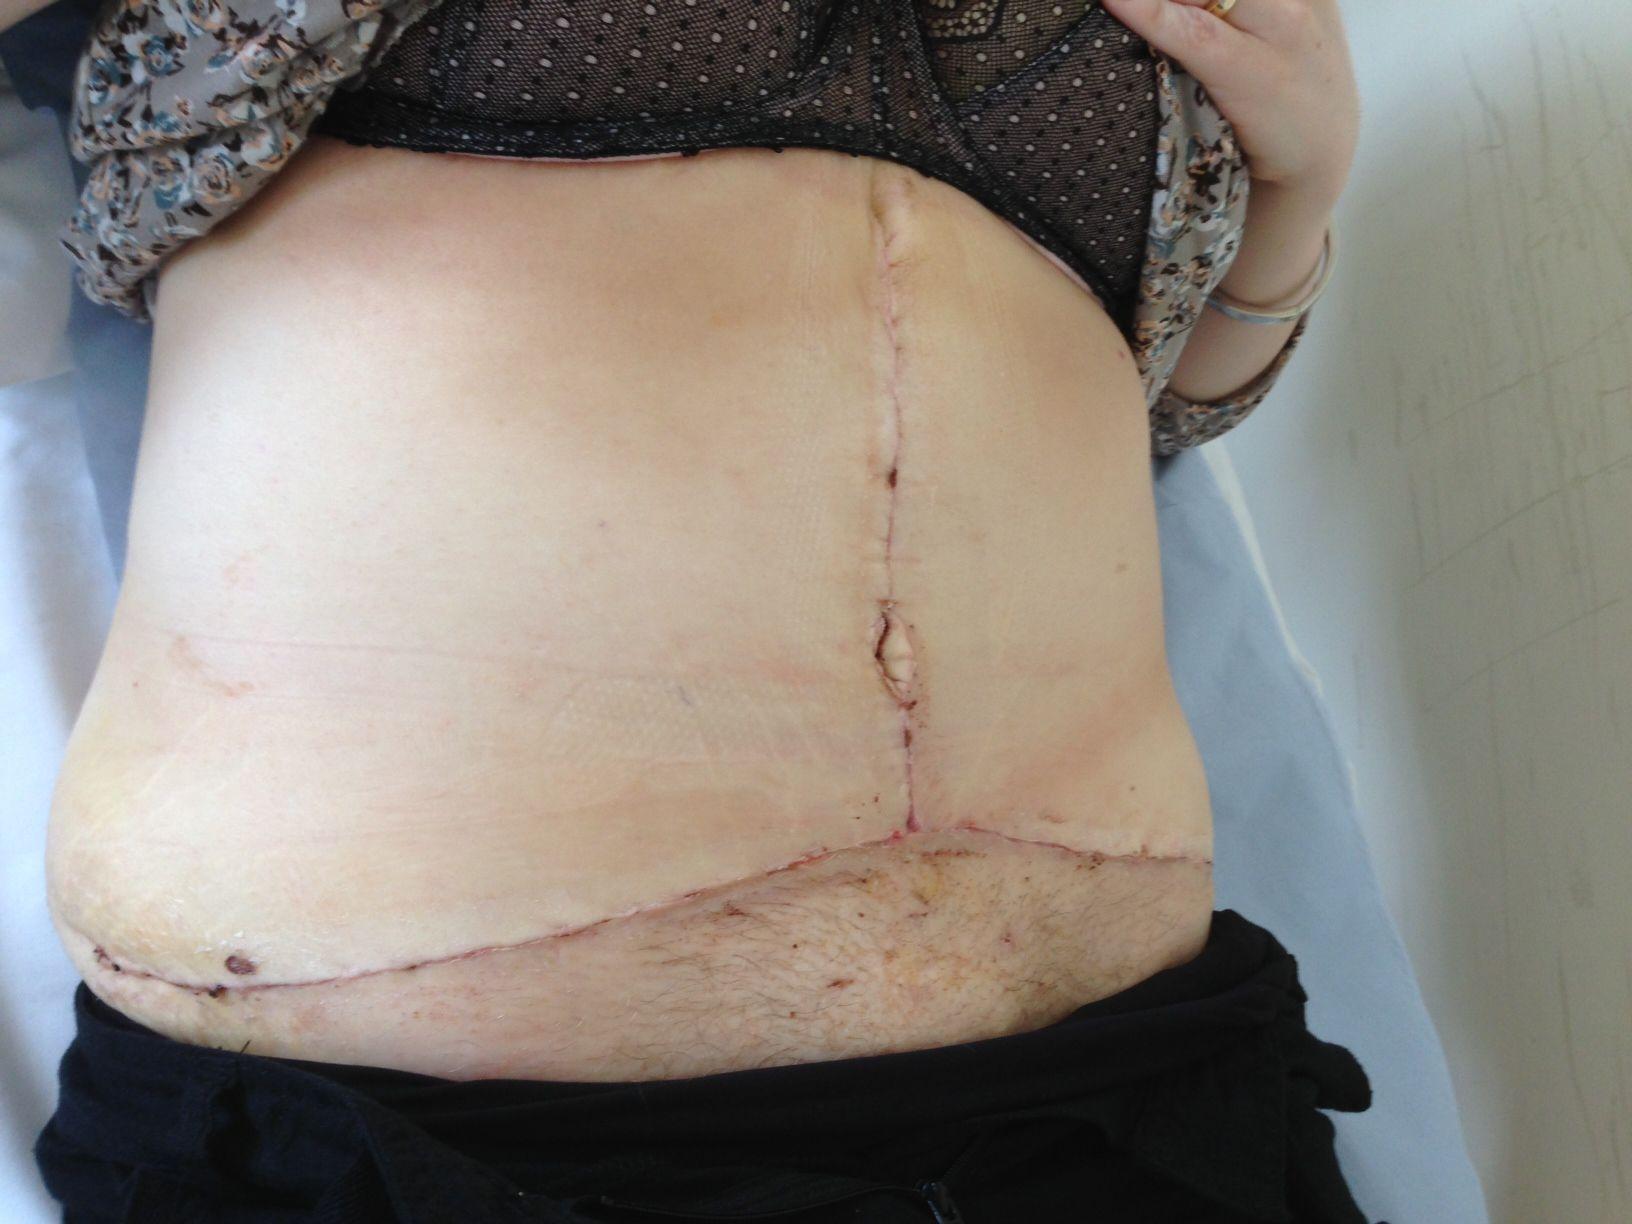 Bad Tummy Tuck Example Celebrity Plastic Surgery Bad